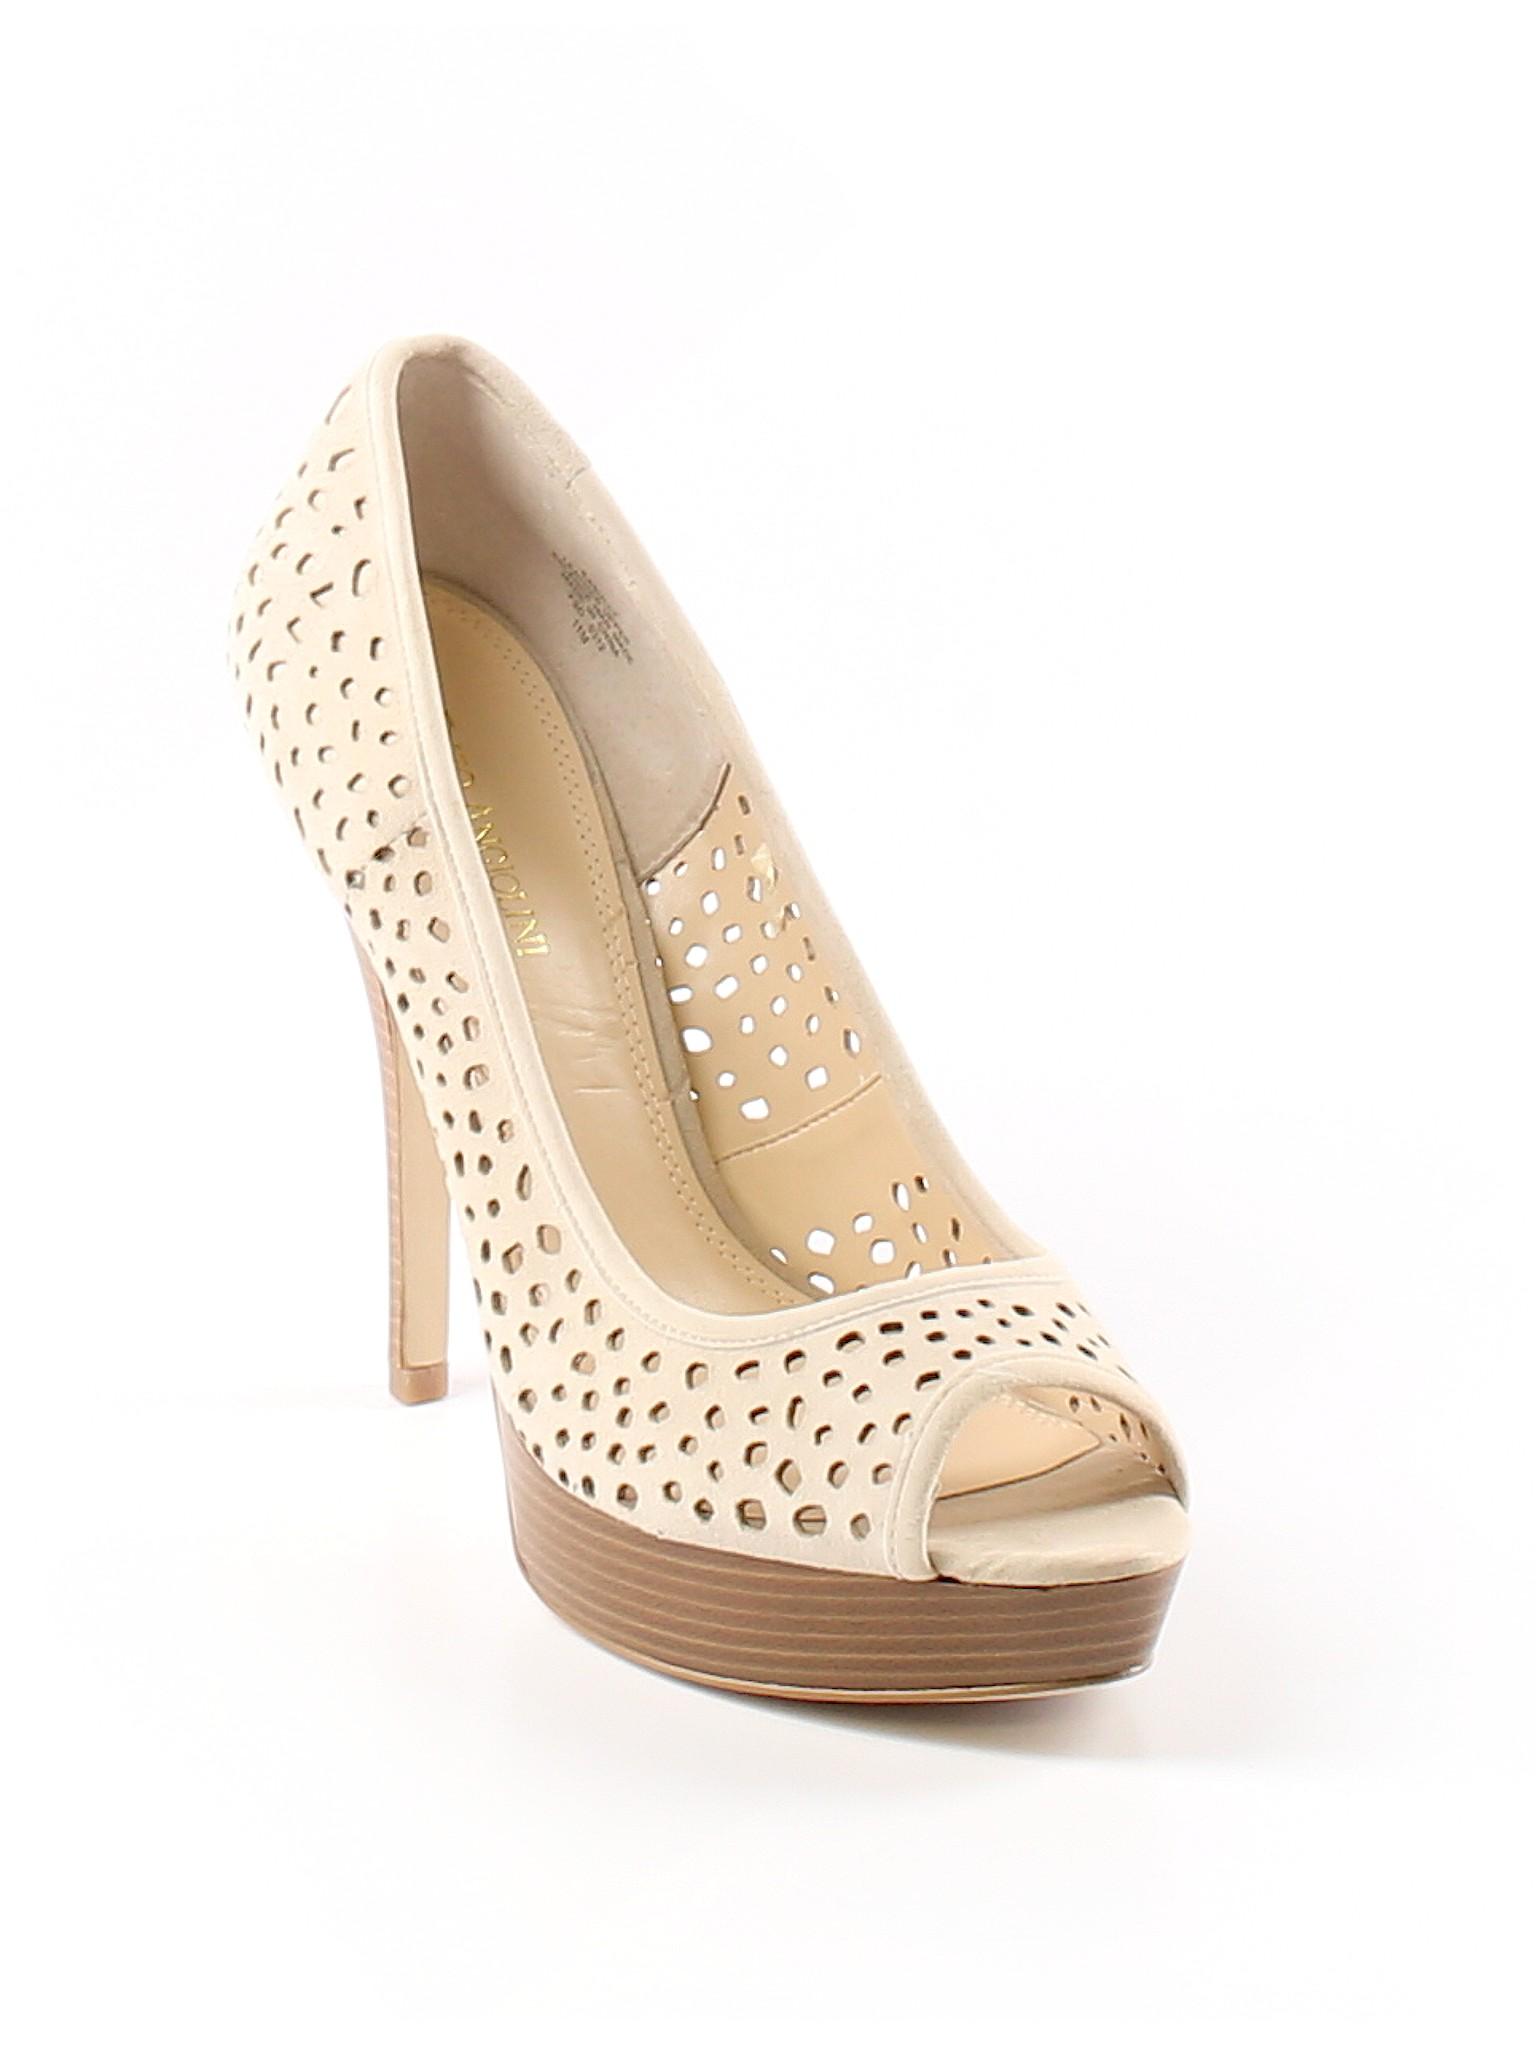 Boutique Angiolini promotion Angiolini promotion Boutique Heels Enzo Heels Enzo rrw6q4S